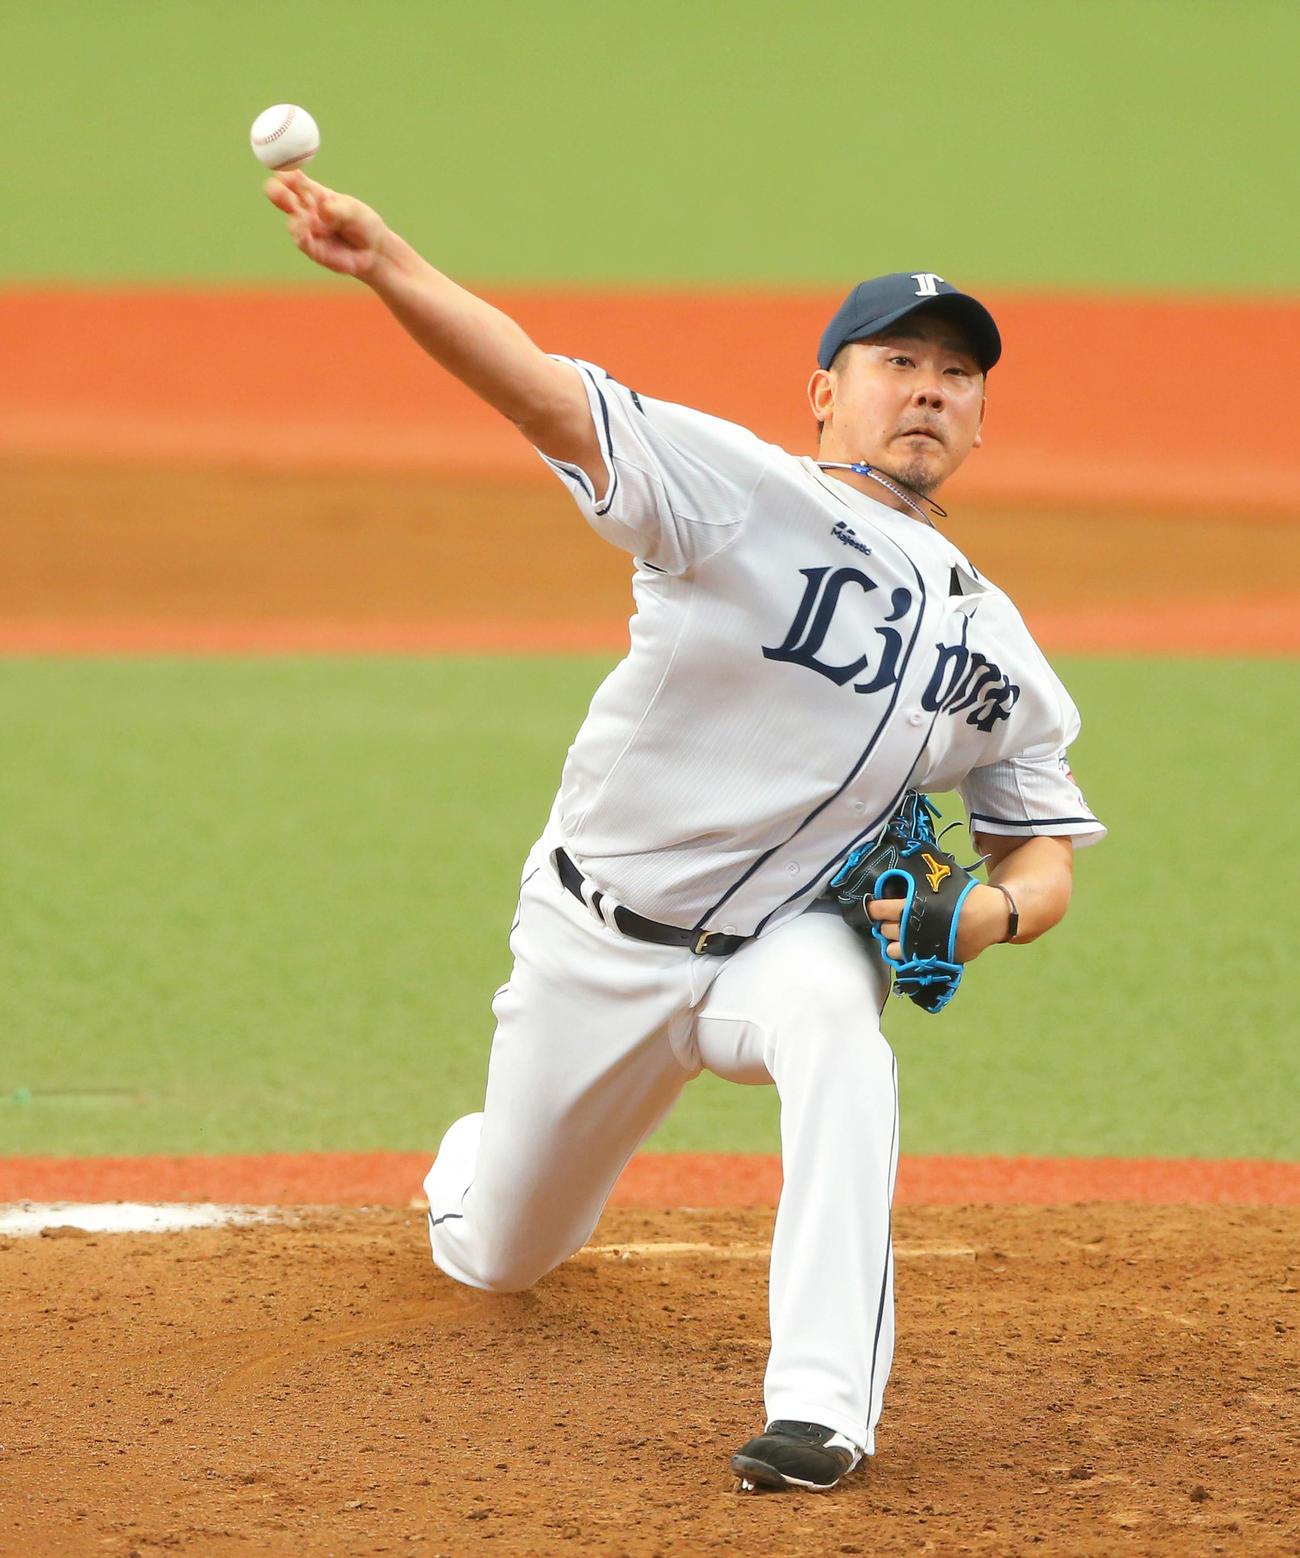 西武対中日 6回表に登板する西武松坂(撮影・河田真司)